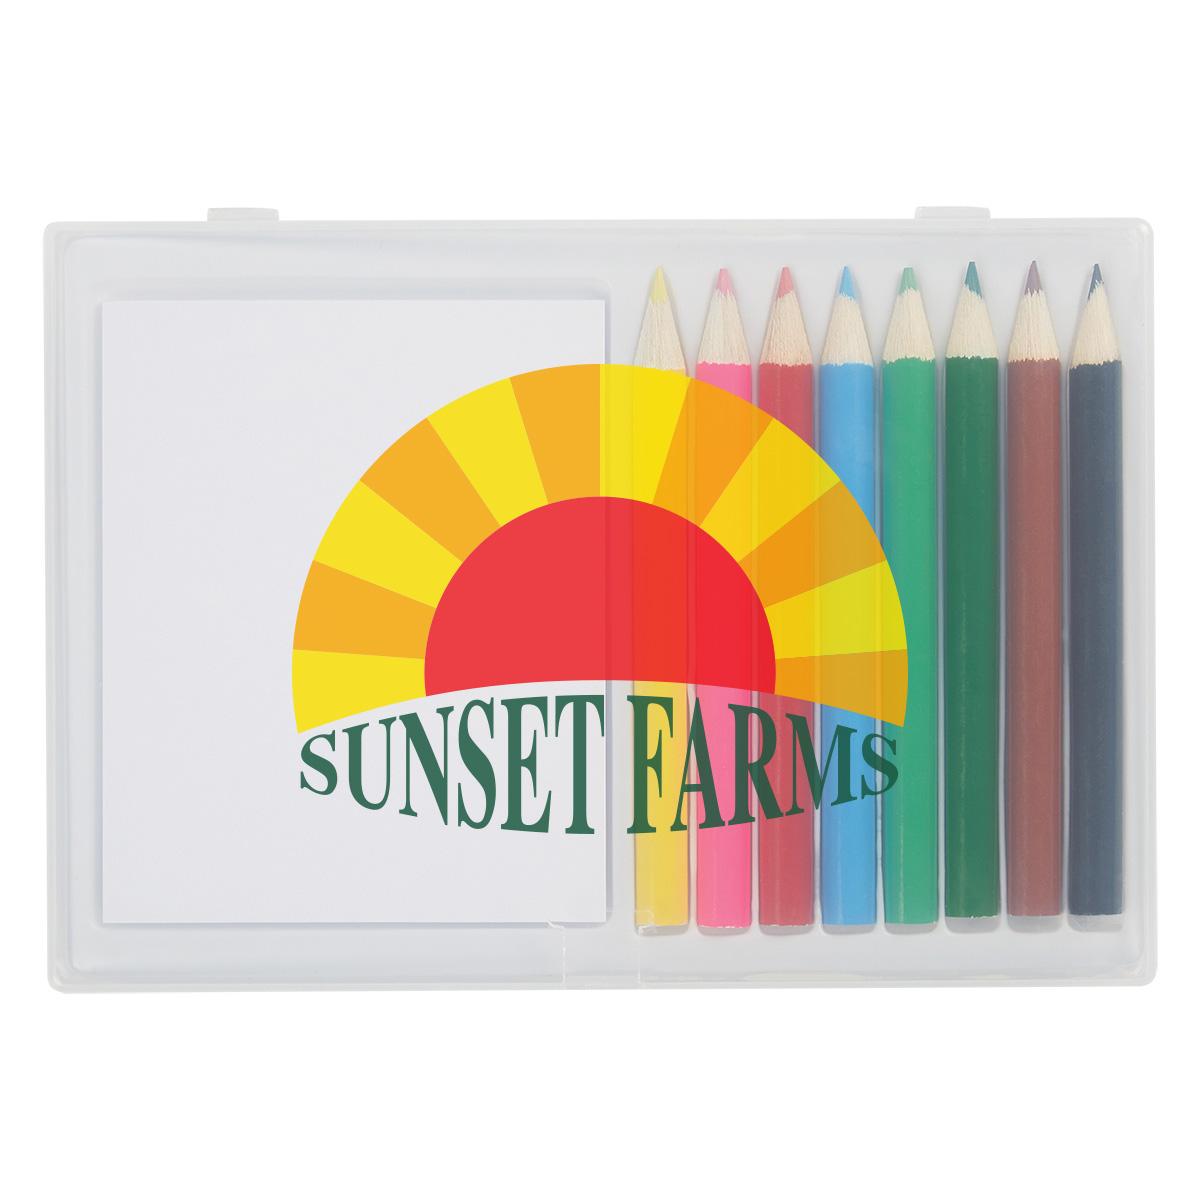 #CM 461 - 8-Piece Colored Pencil Art Set In Case